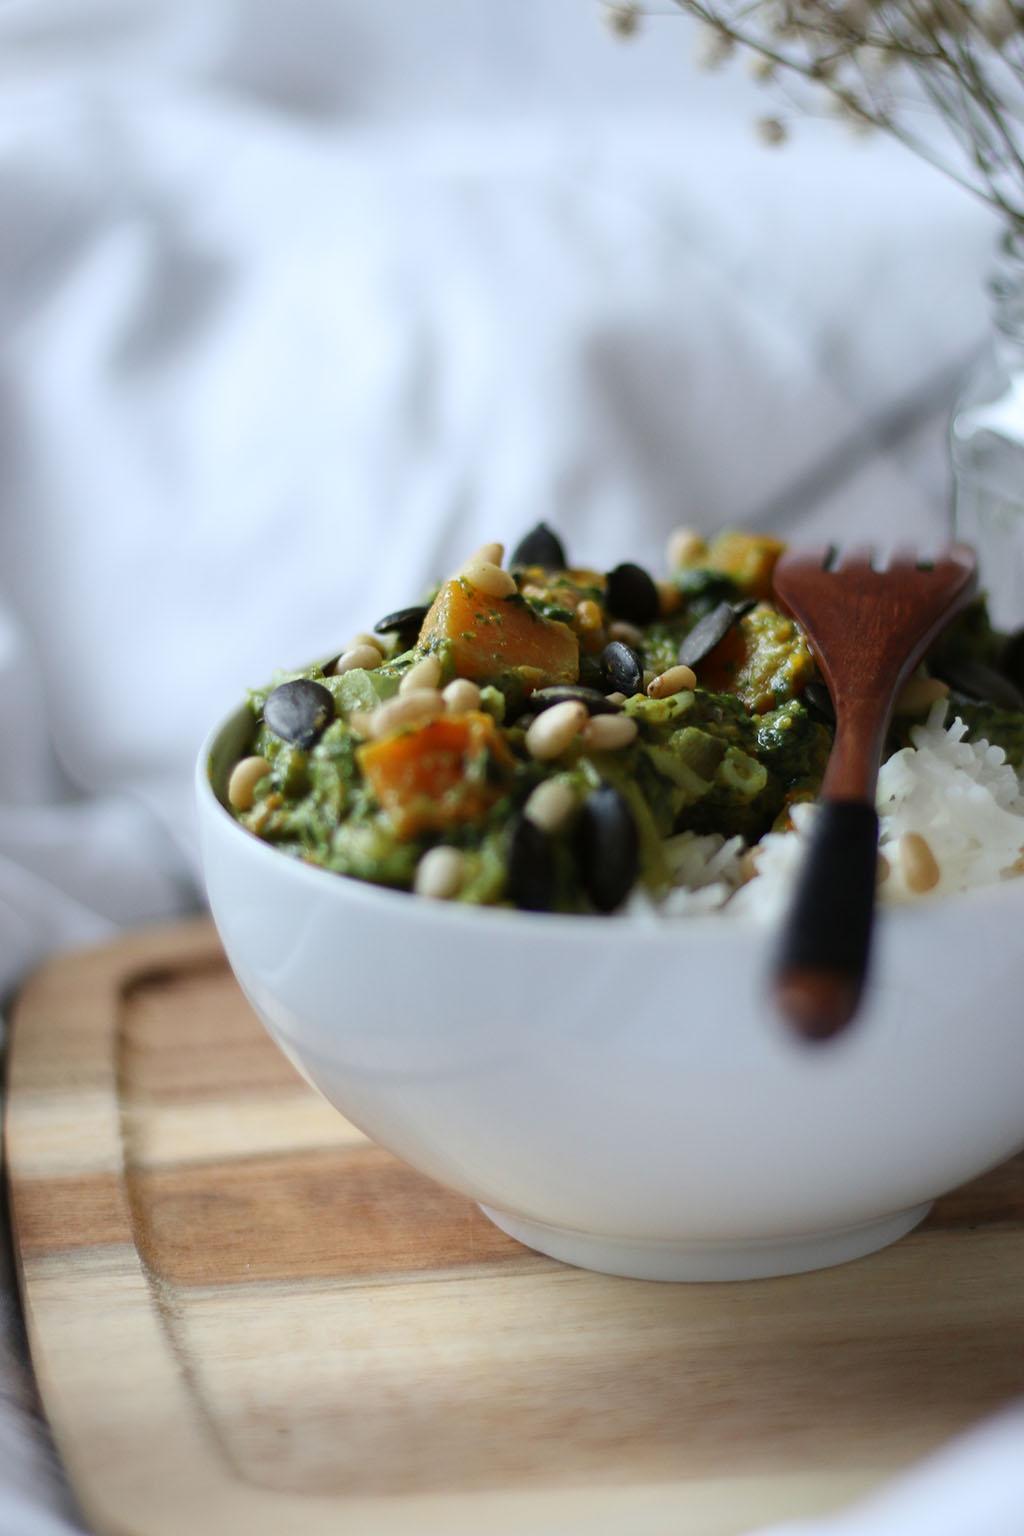 curry potiron epinards lait de coco lepetitmondedelodie